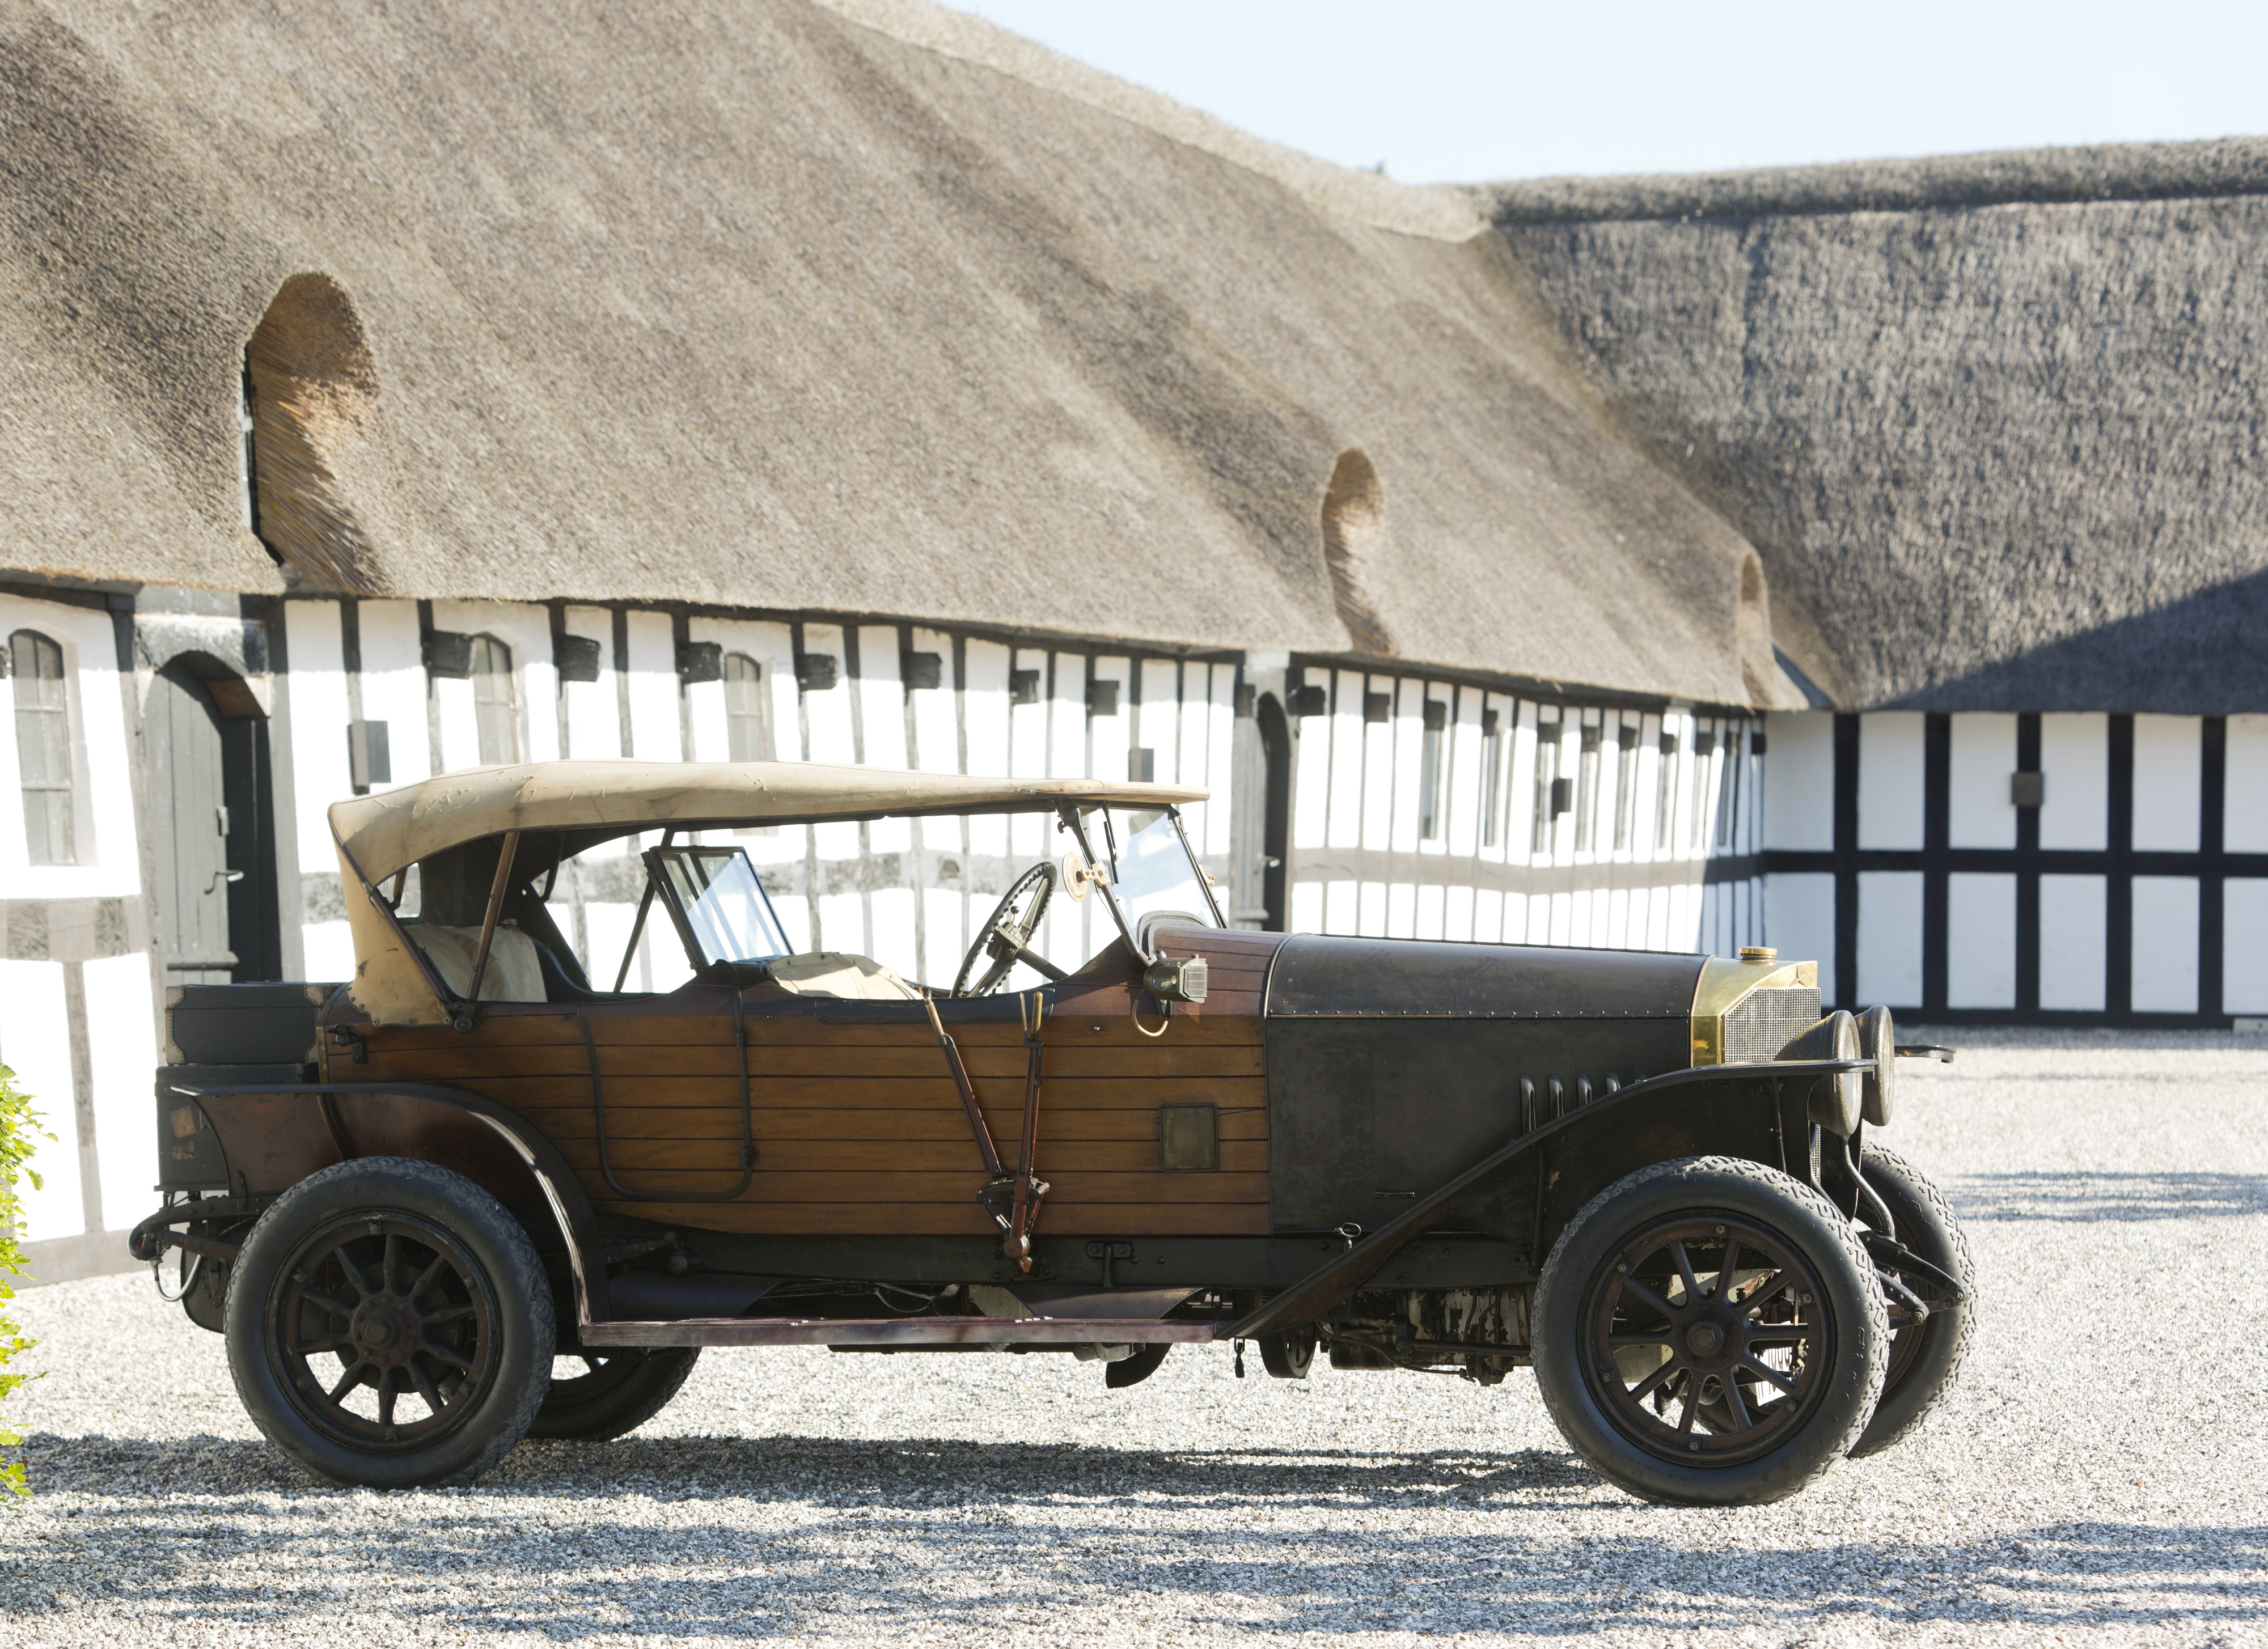 Bonhams auction legendary $40M private car collection - CNN Style